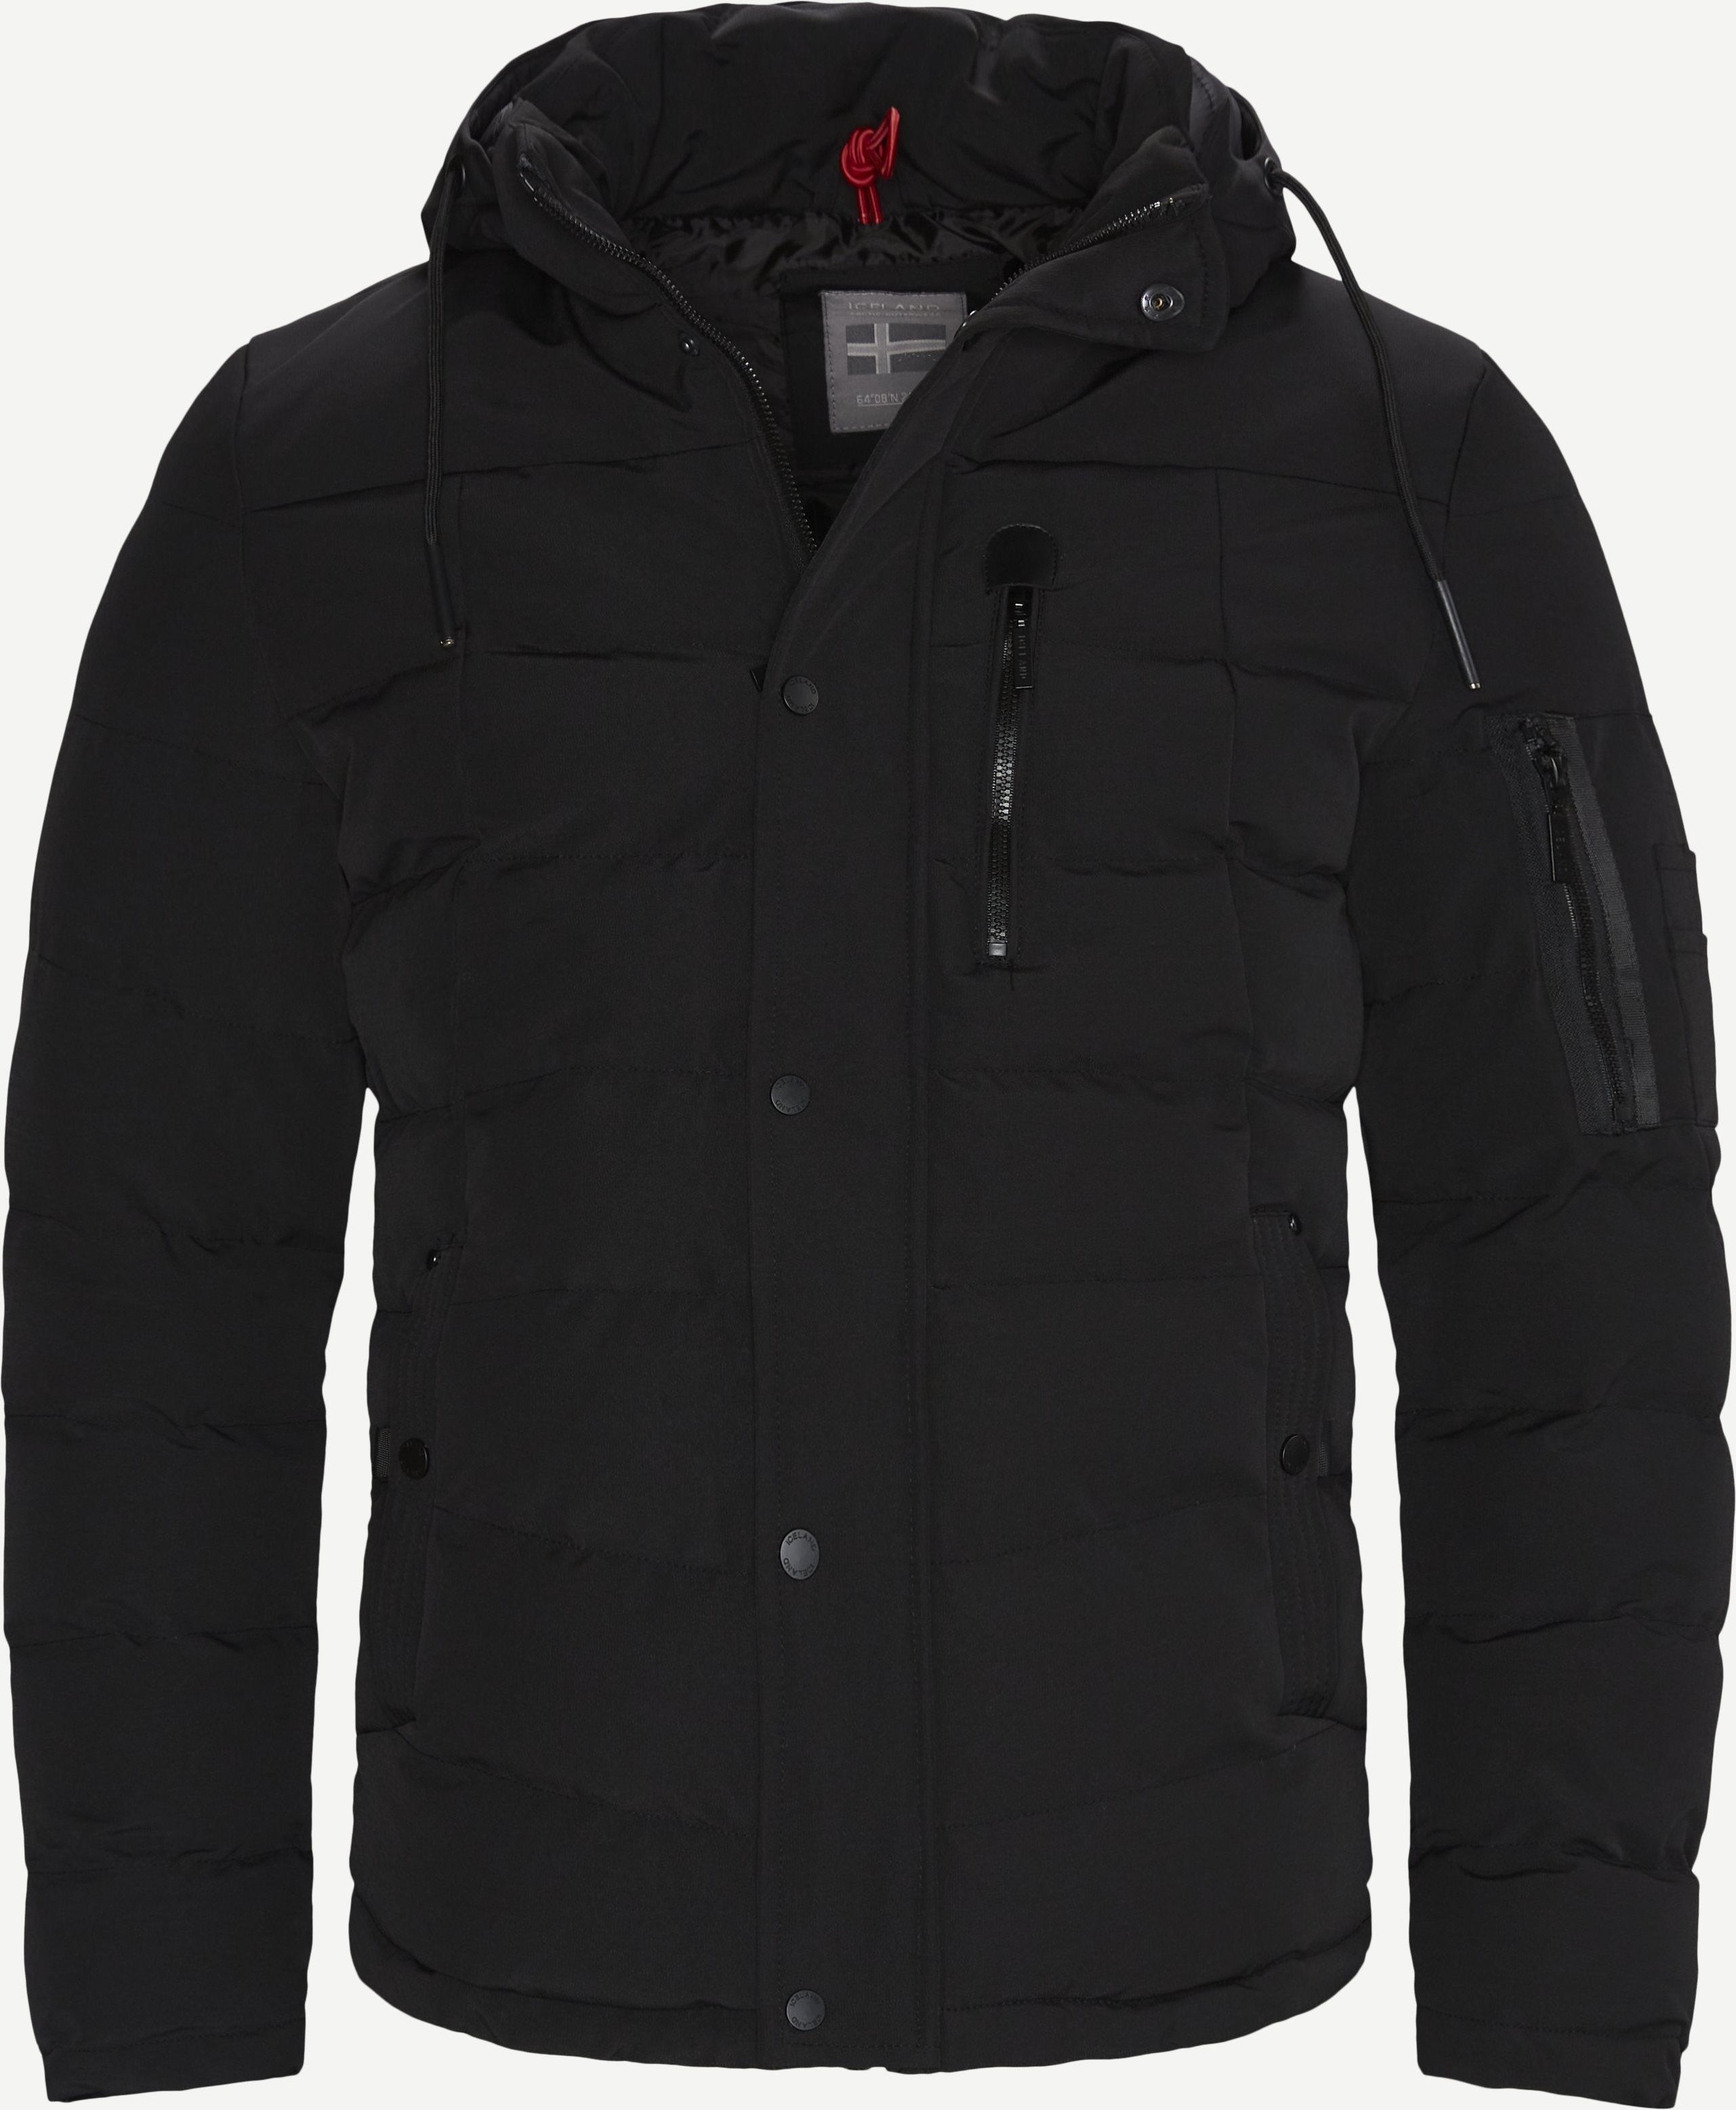 Selfoss Jacket - Jackets - Regular fit - Black